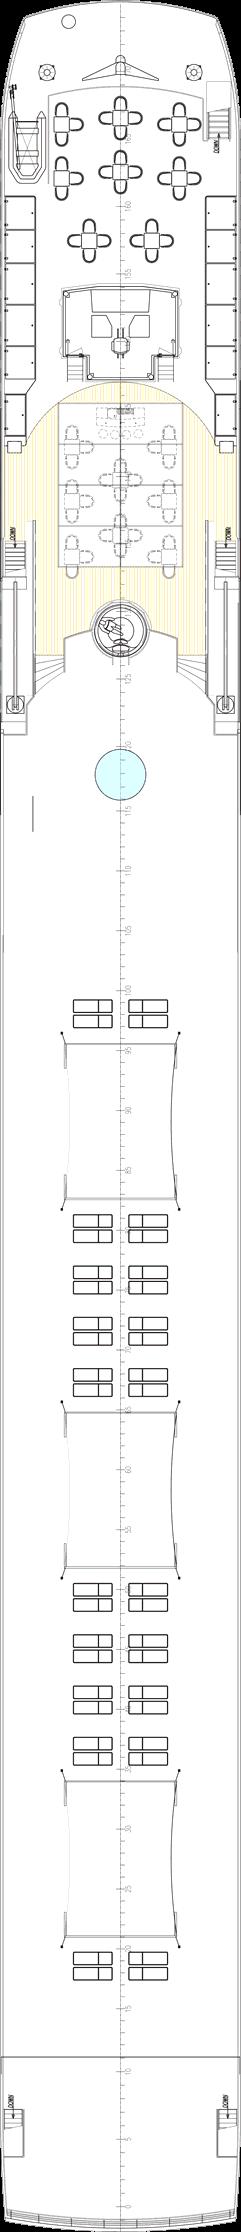 Avalon Visionary: Sky Deck